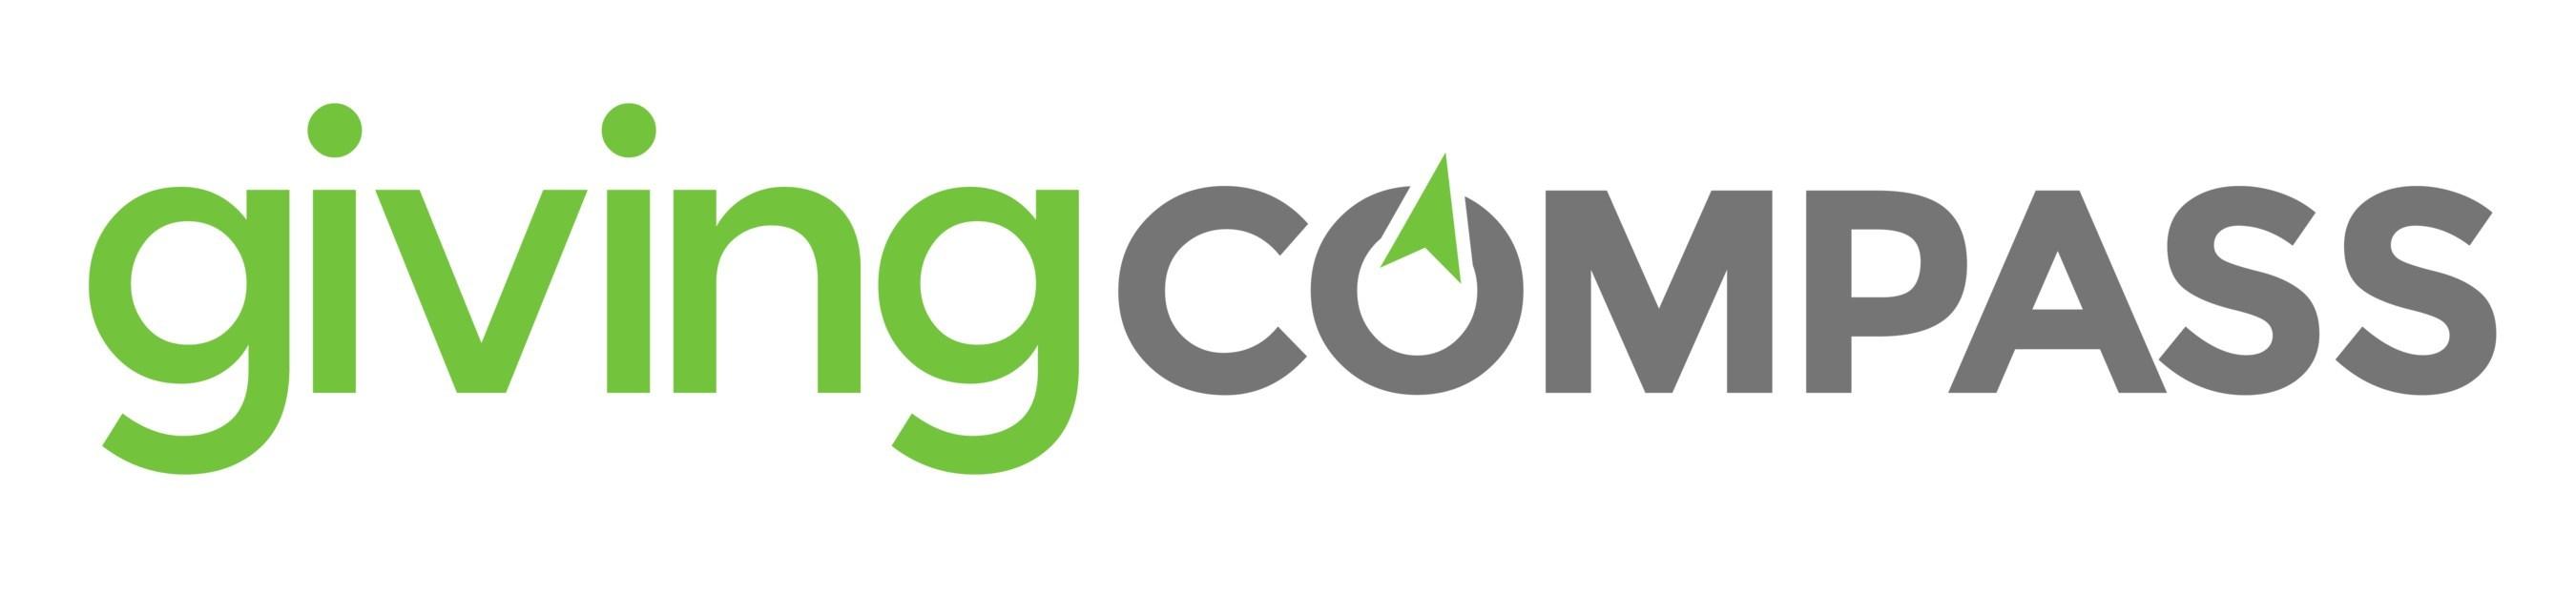 www.givingcompass.org